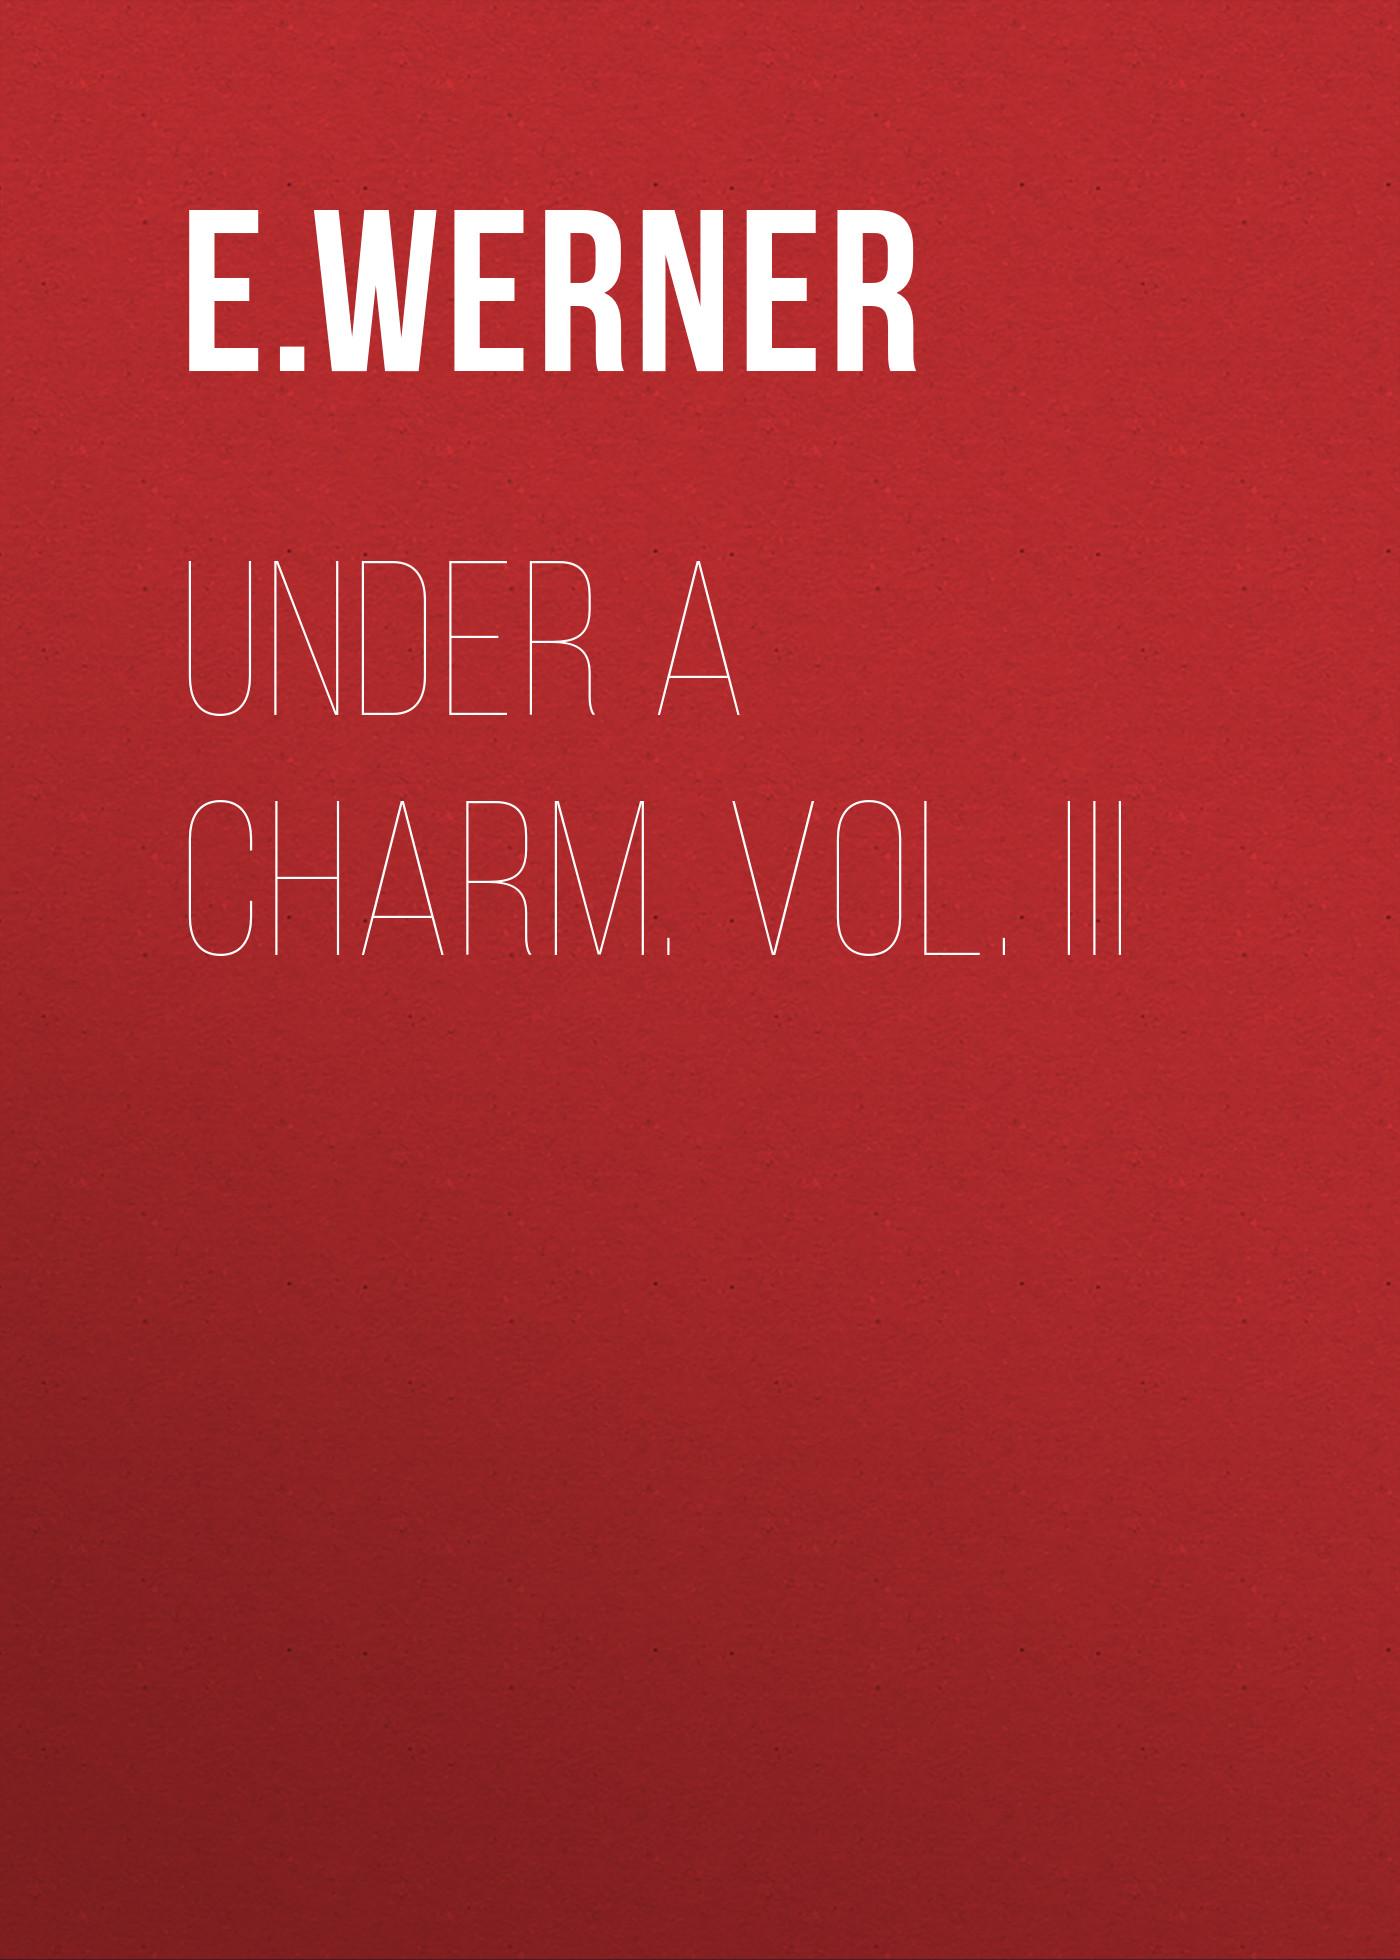 E. Werner Under a Charm. Vol. III mauro palumbo tabula risa vol iii